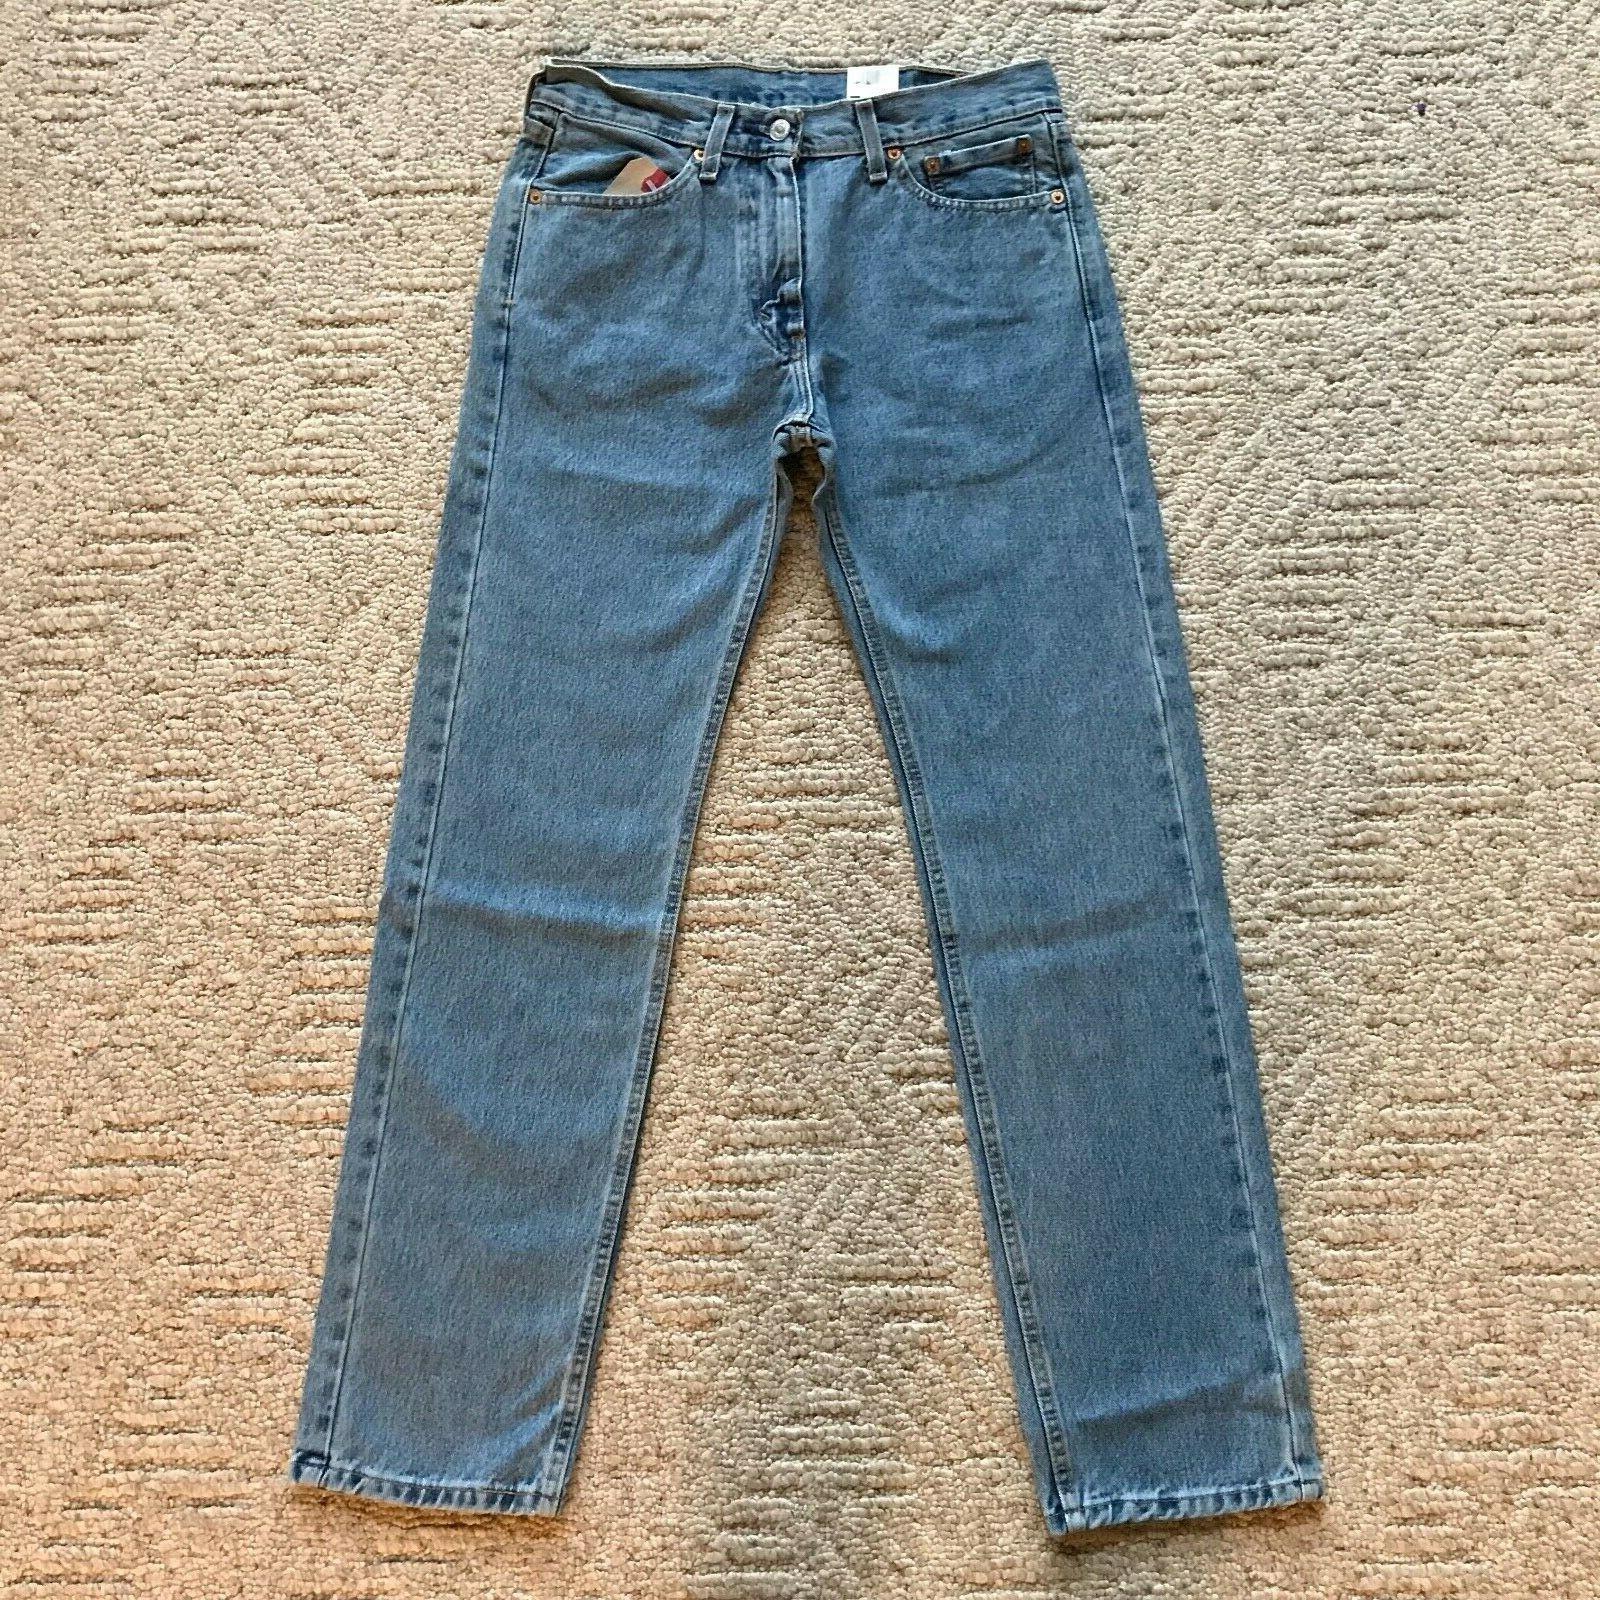 NWT Classic Regular Fit Straight Leg Denim Jeans All size